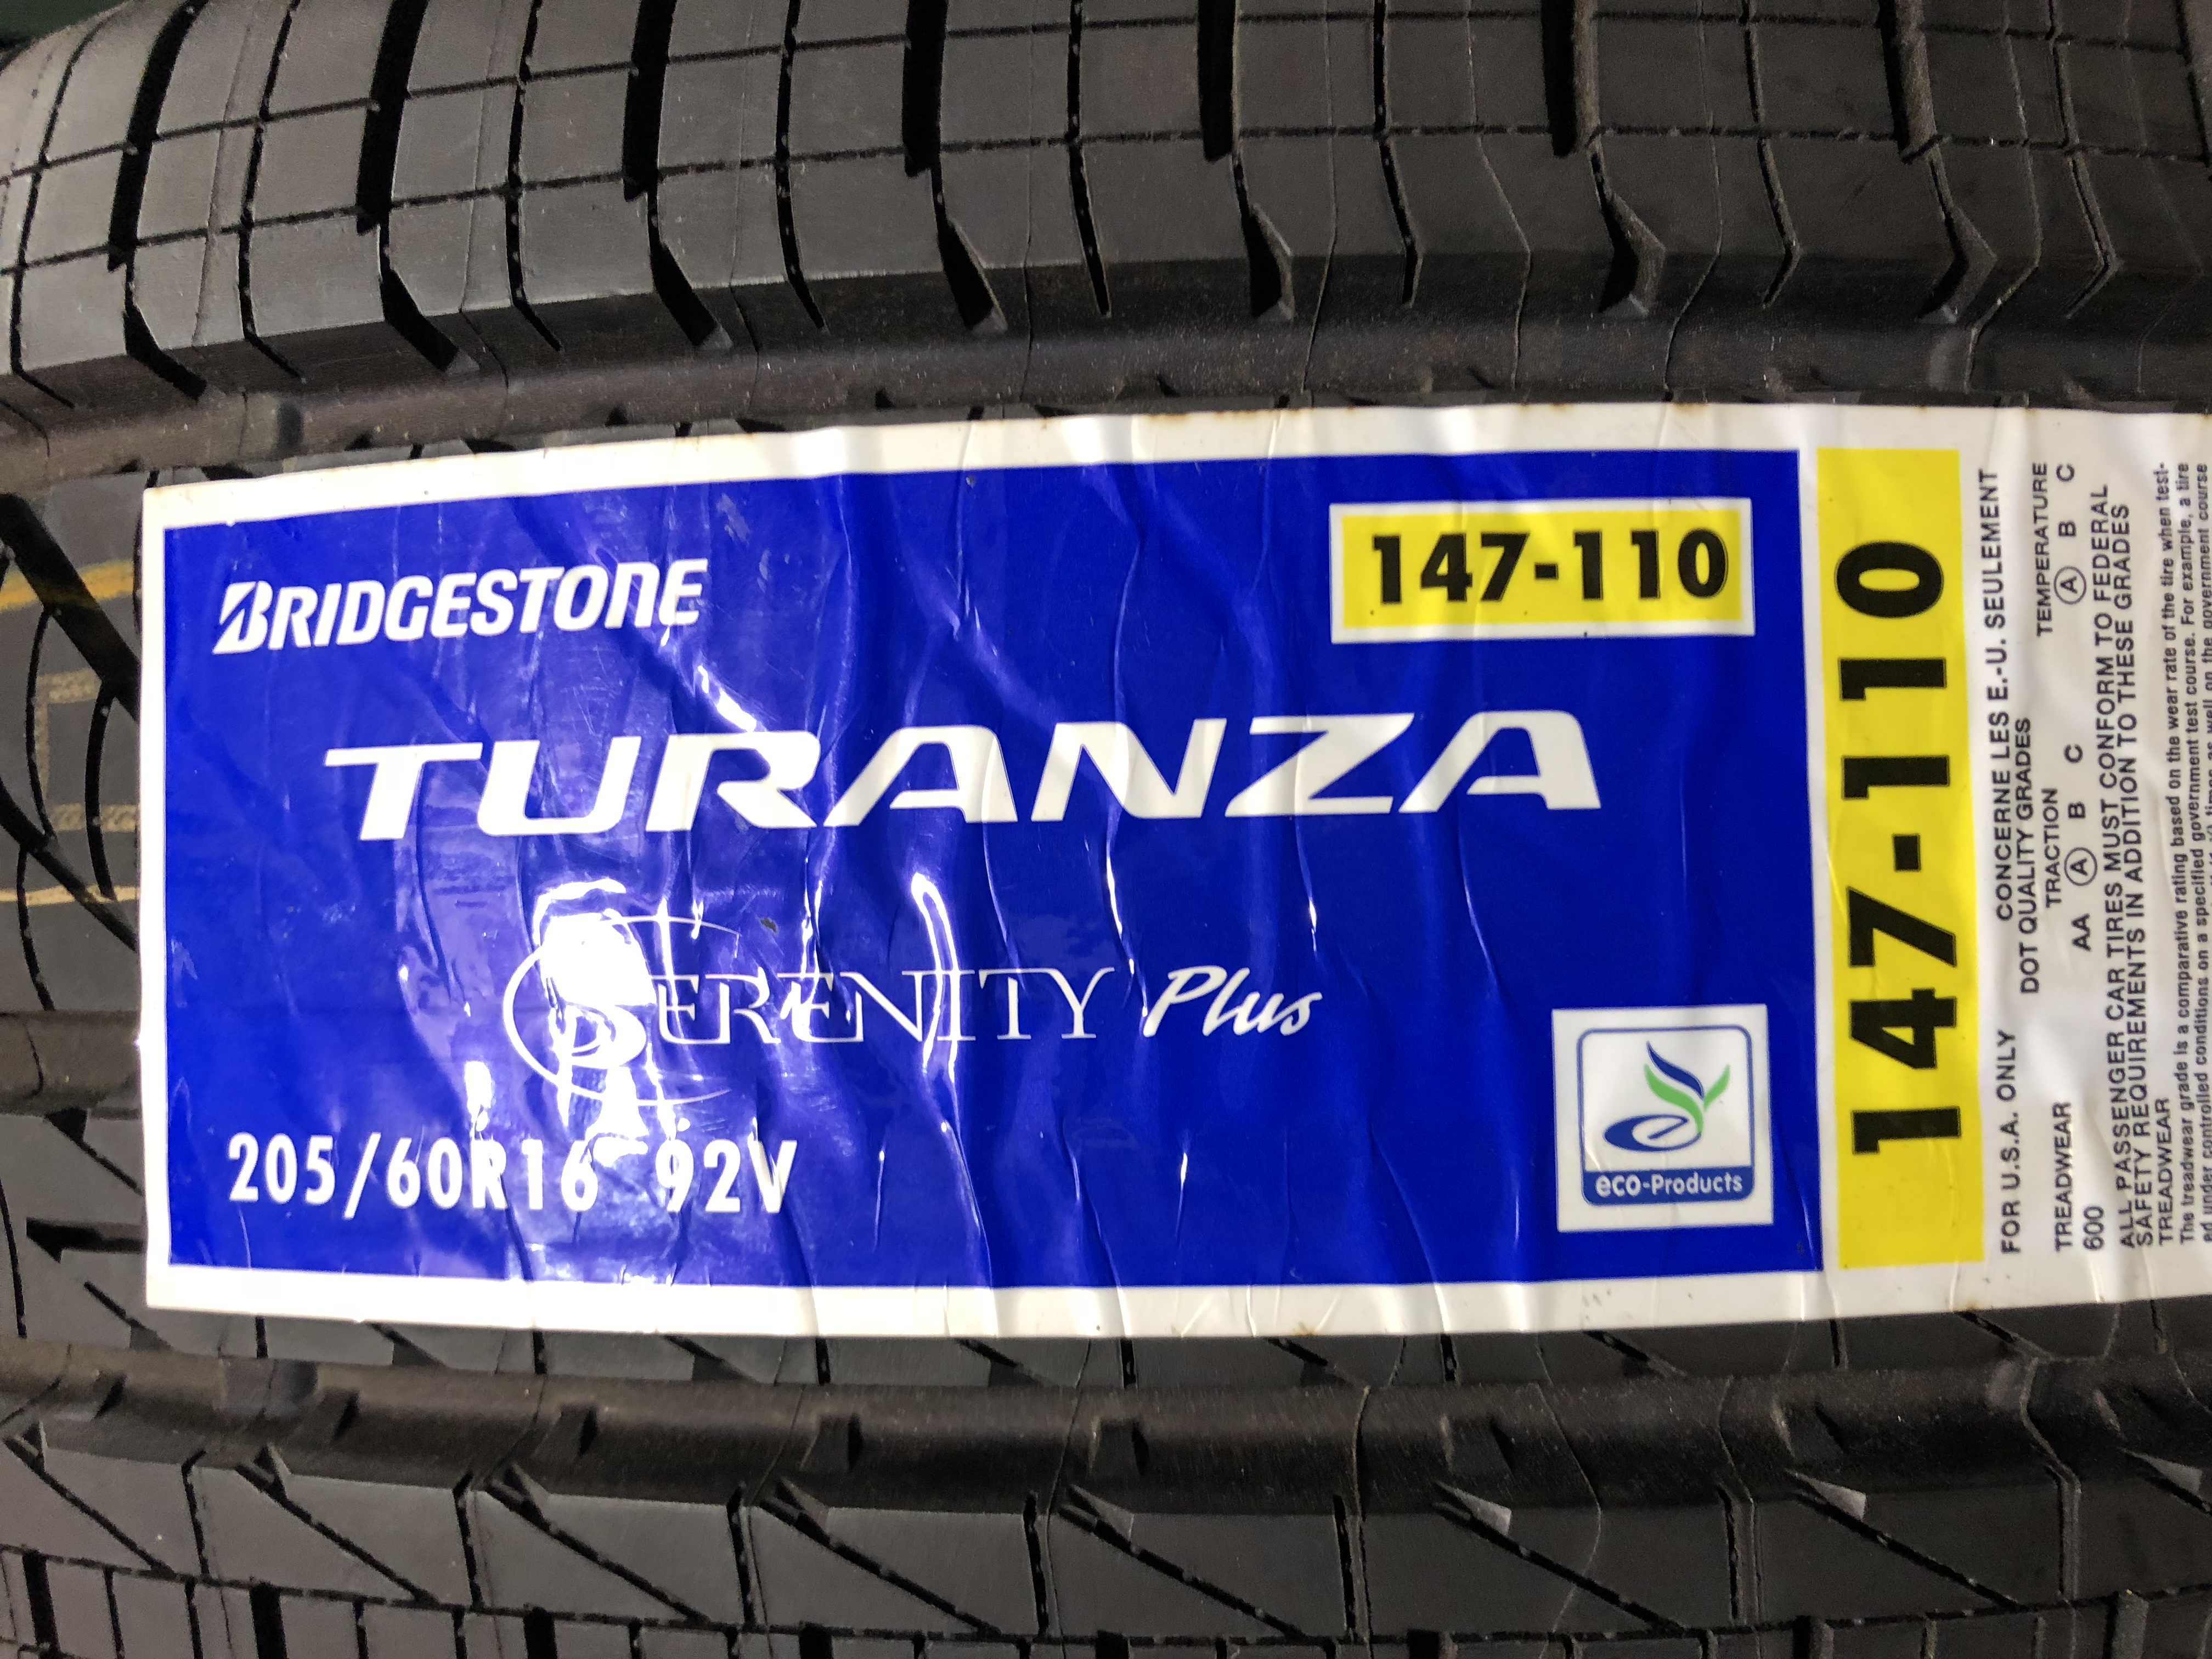 Bridgestone Turanza Serenity Plus >> 215 50 R17 Bridgestone Turanza Serenity Plus Bob Is The